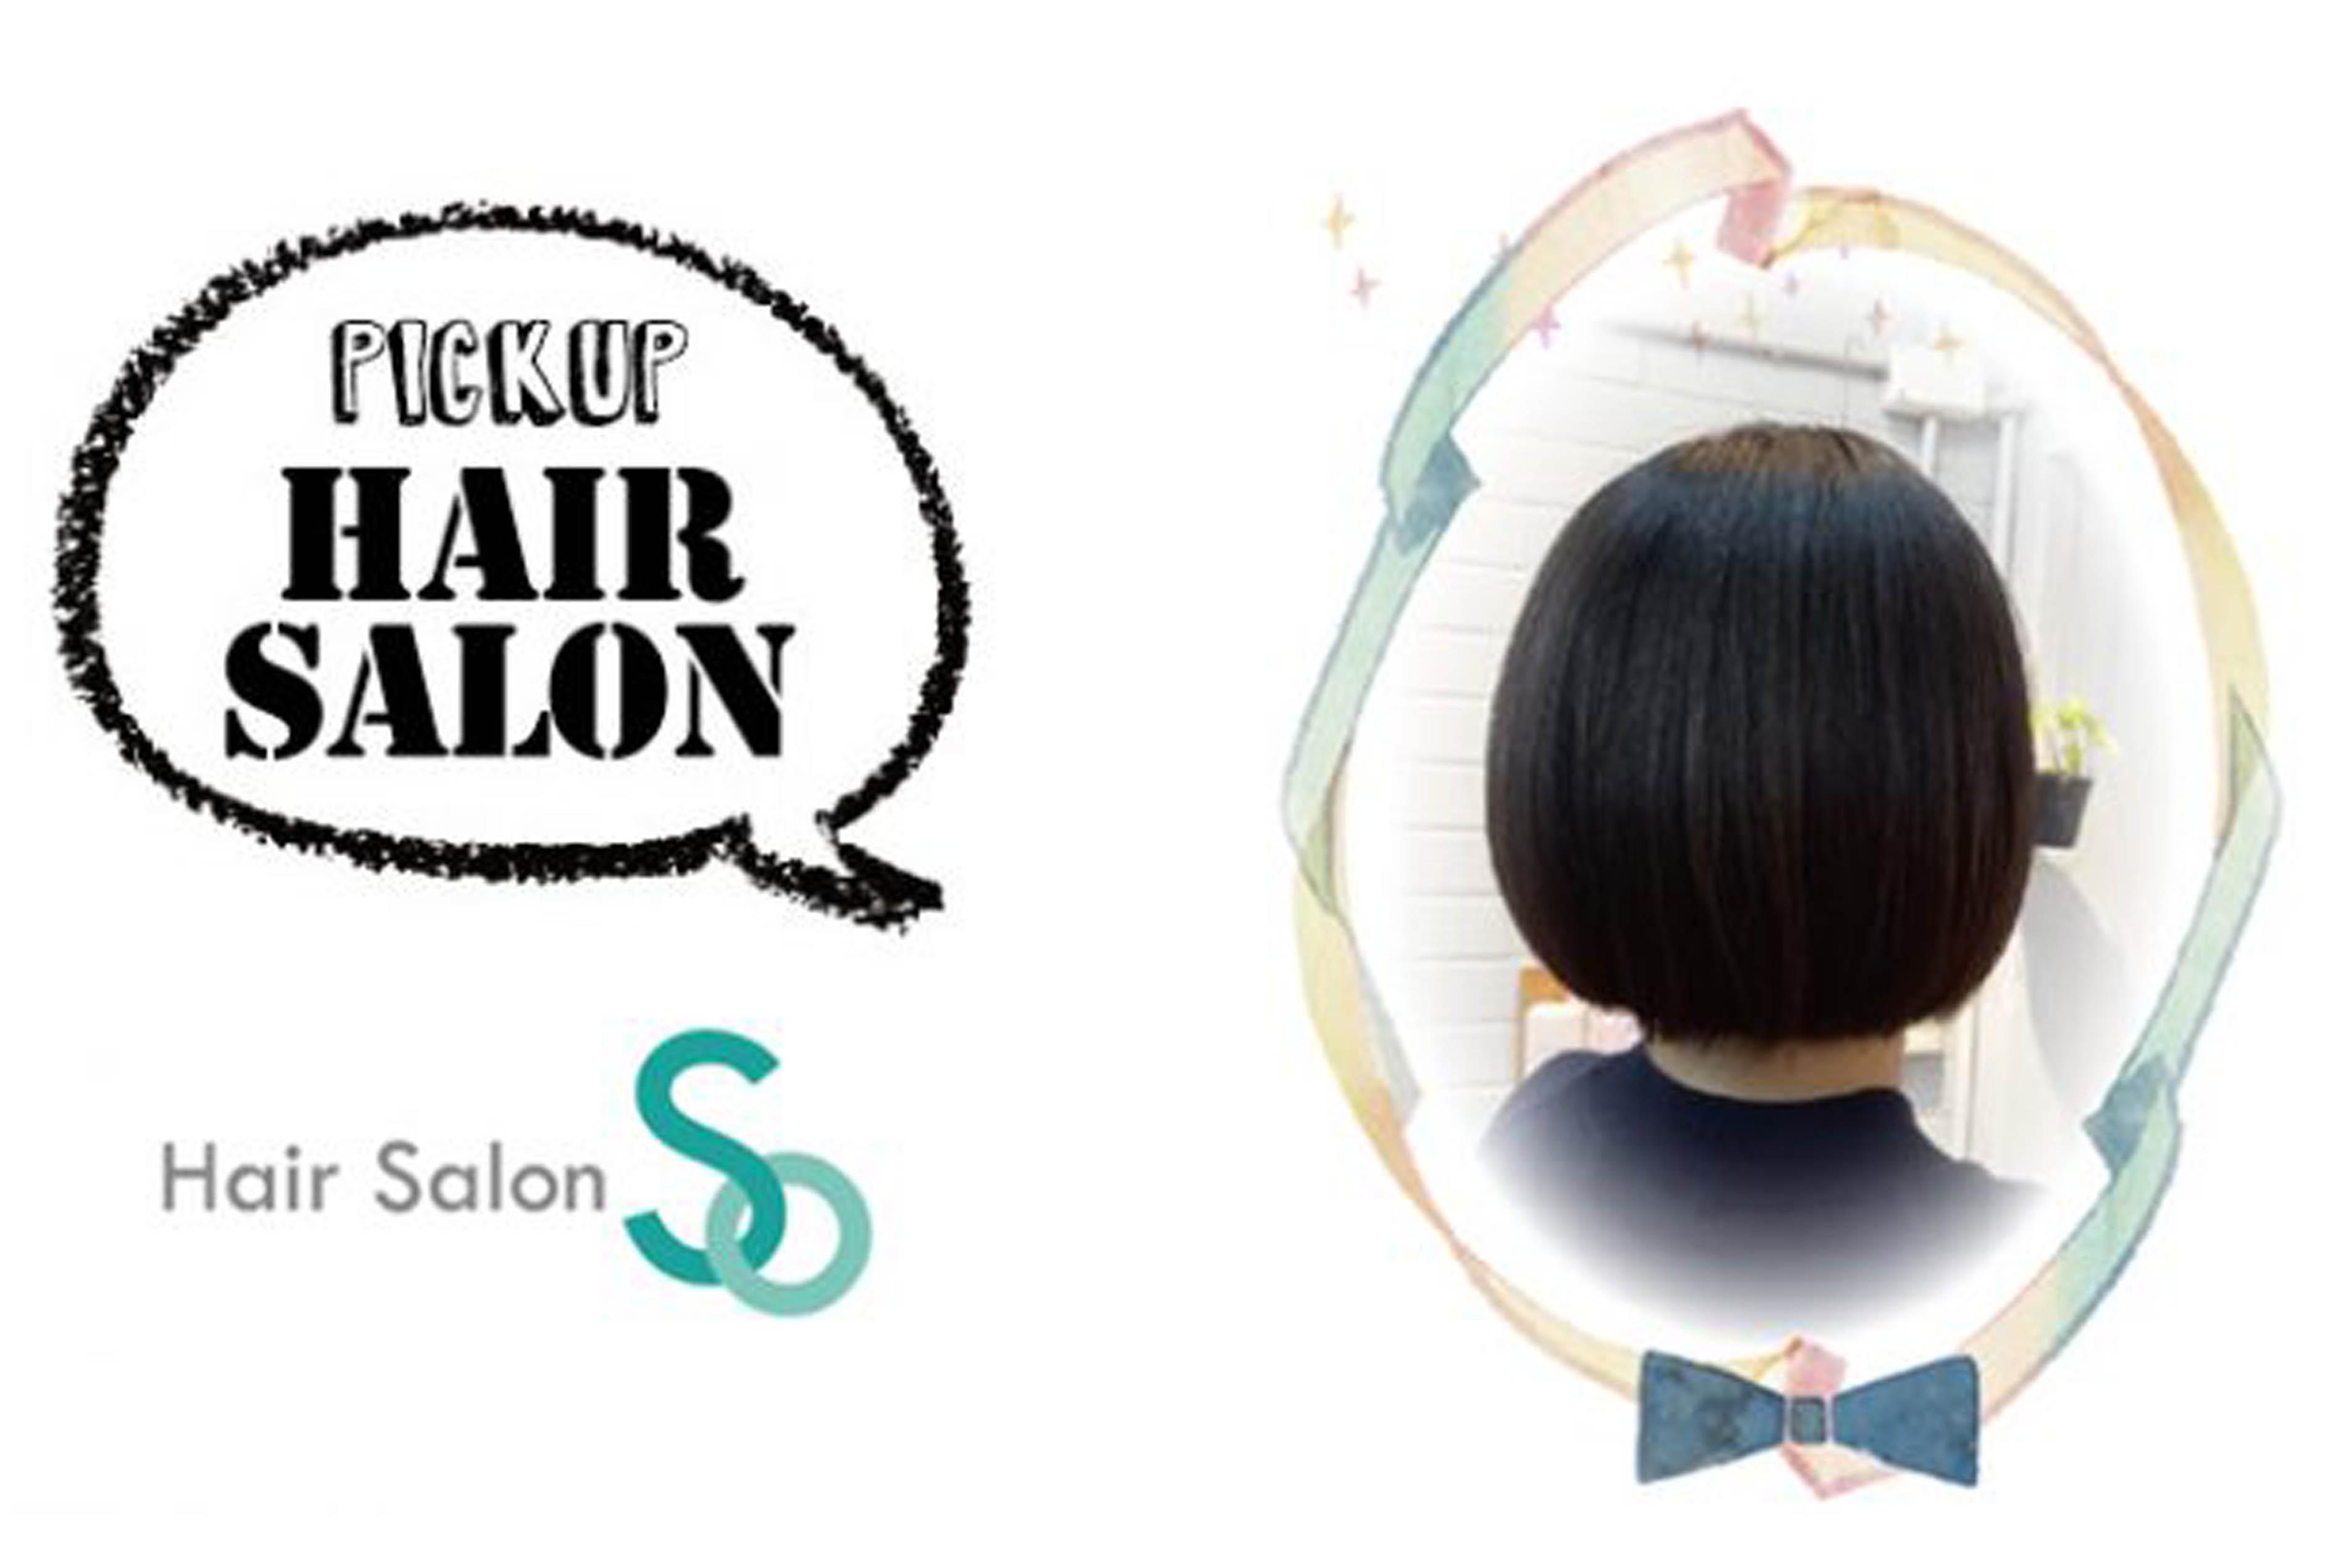 【PICK UP HAIR SALON】 Hair Salon SO